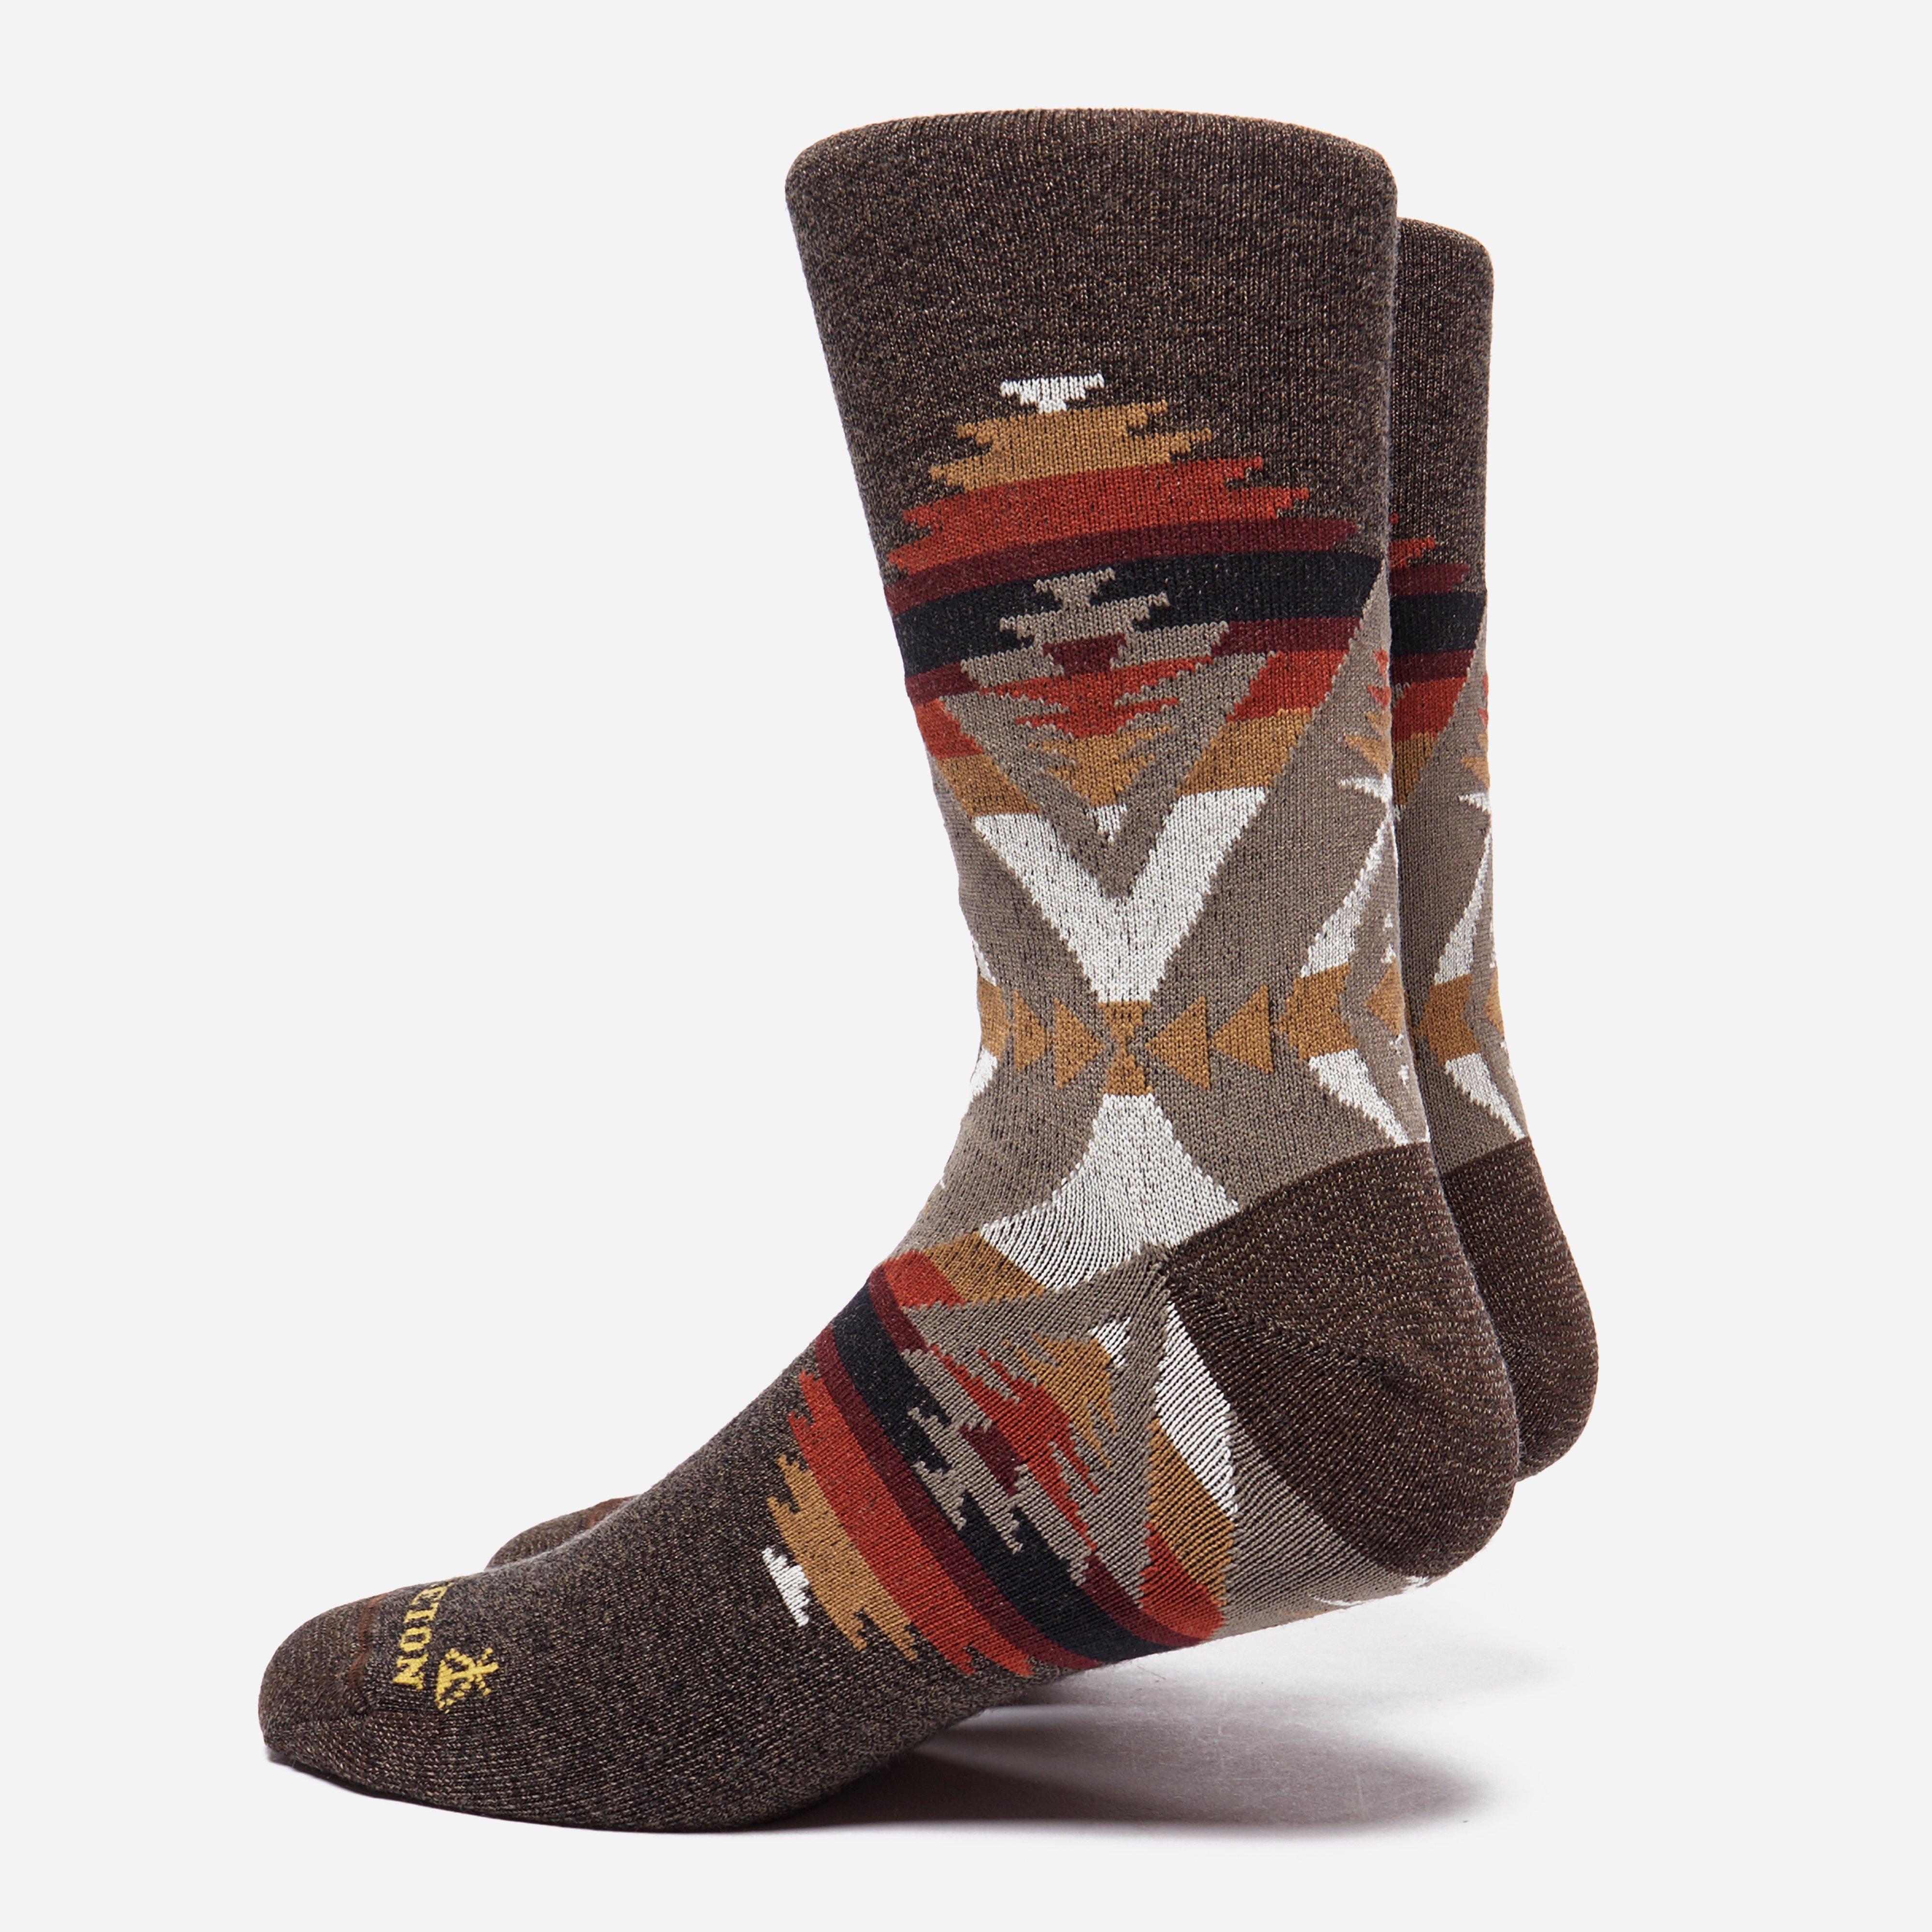 Pendleton Woolen Mills Pacific Crest Merino Socks